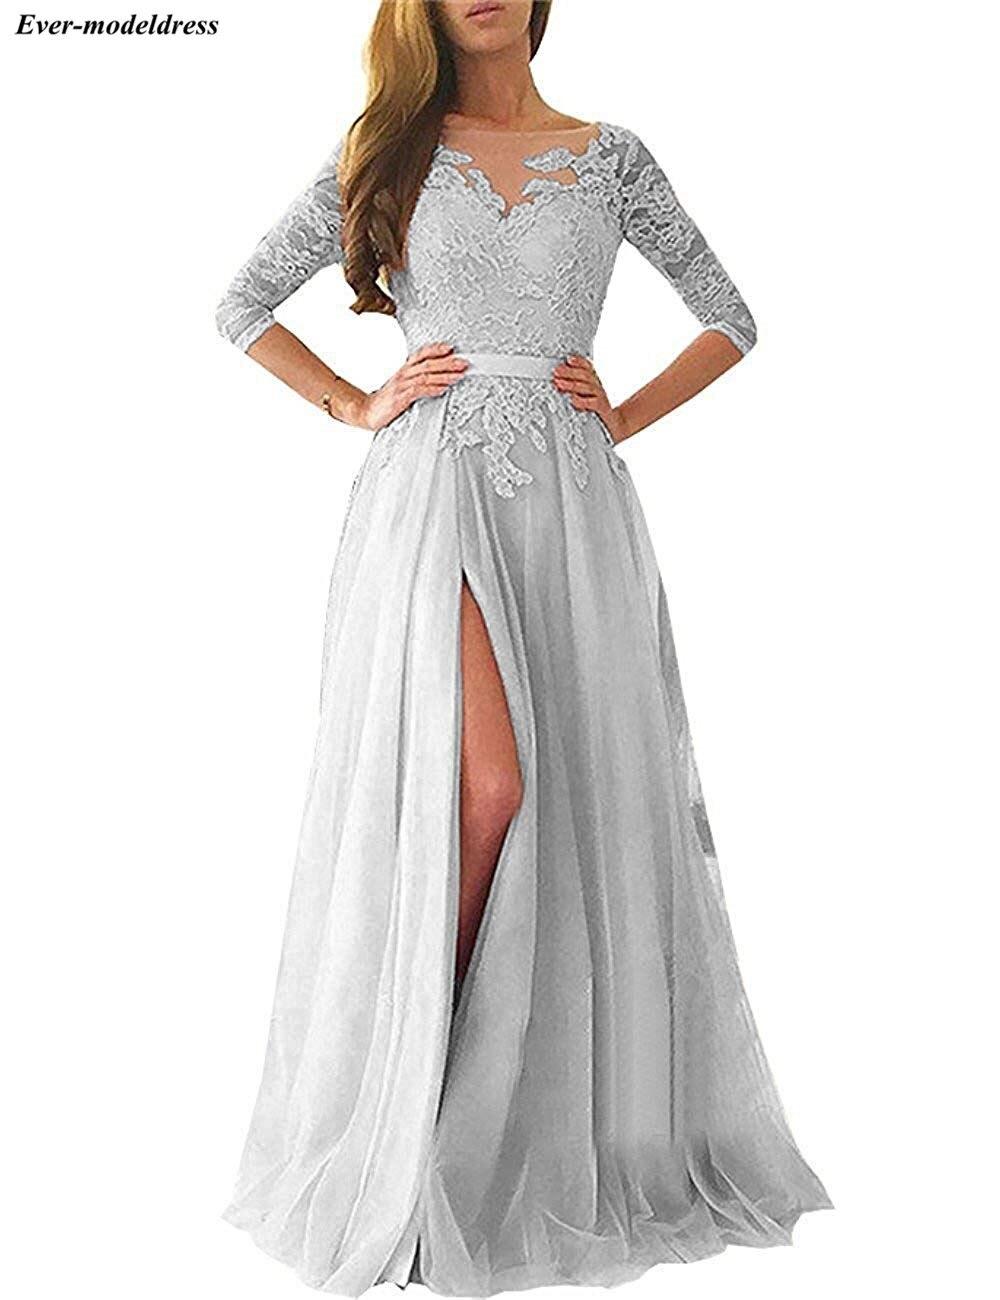 Купить с кэшбэком Blush Pink Bridesmaid Dresses 2020 Sexy A-Line High Split Backless Lace Long Sleeve Floor Length Wedding Guest Prom Party Dress